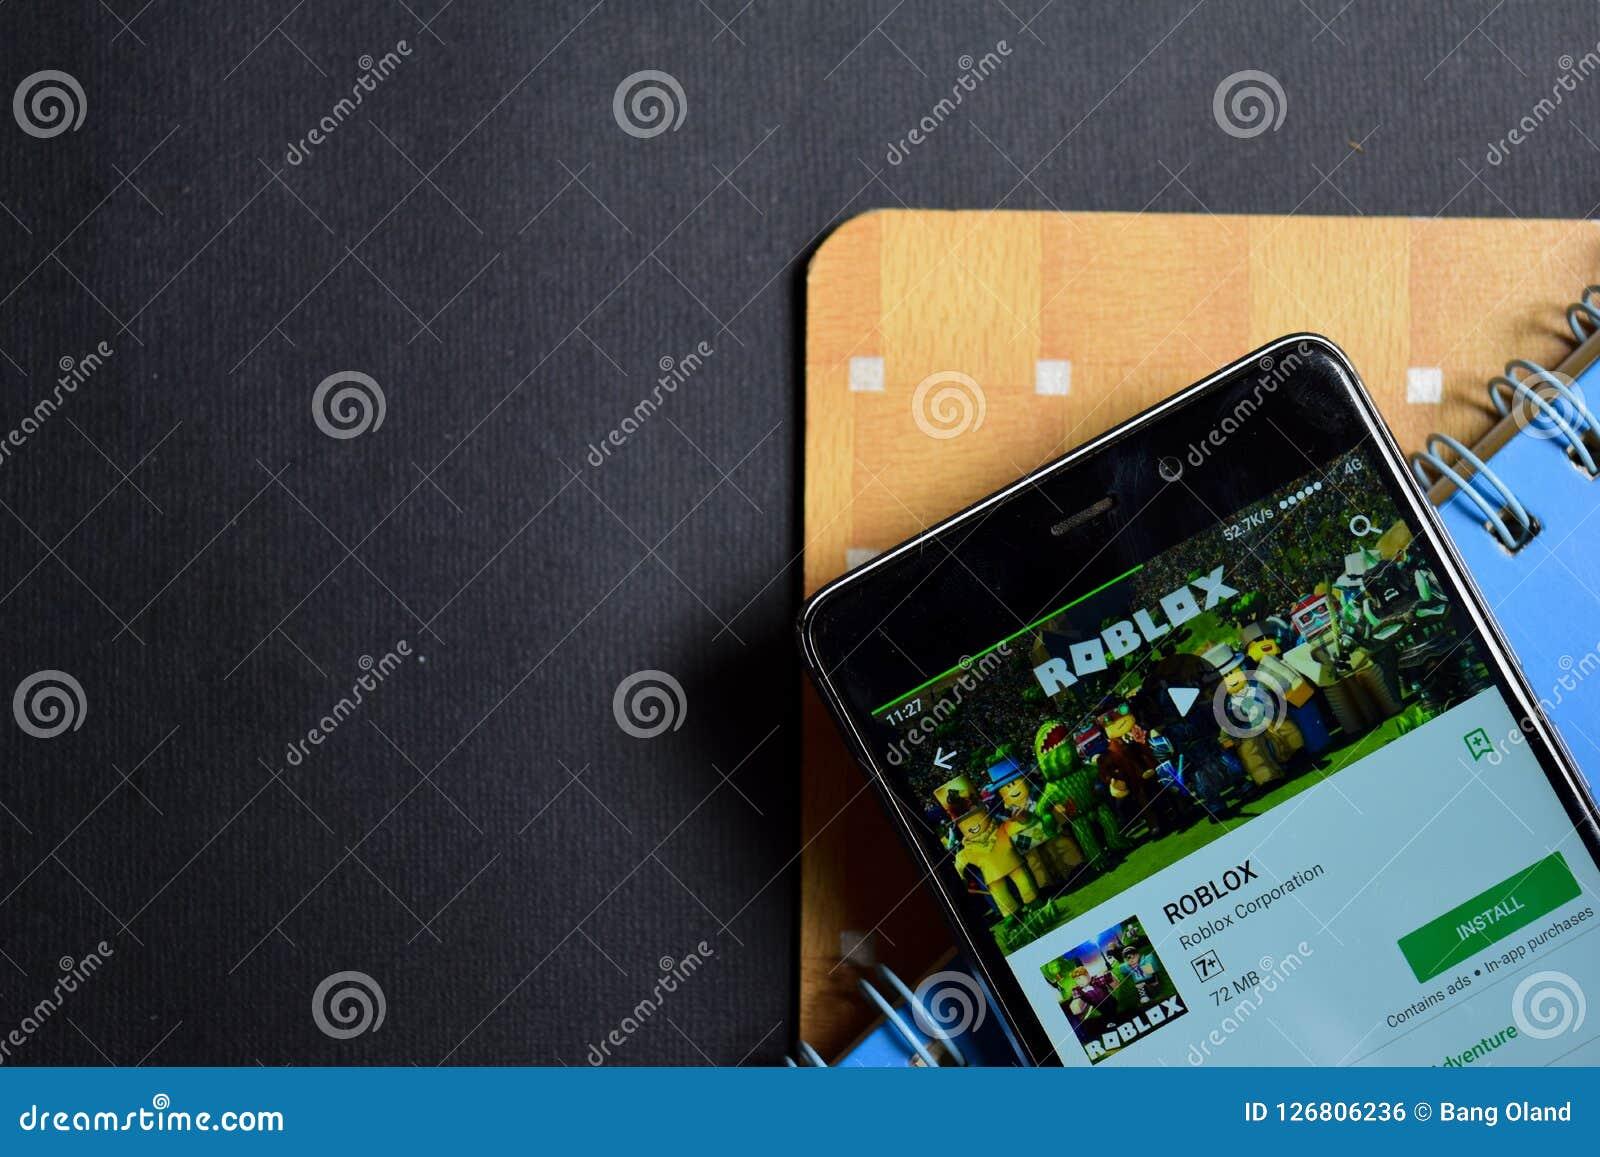 ROBLOX Dev App On Smartphone Screen  Editorial Photo - Image